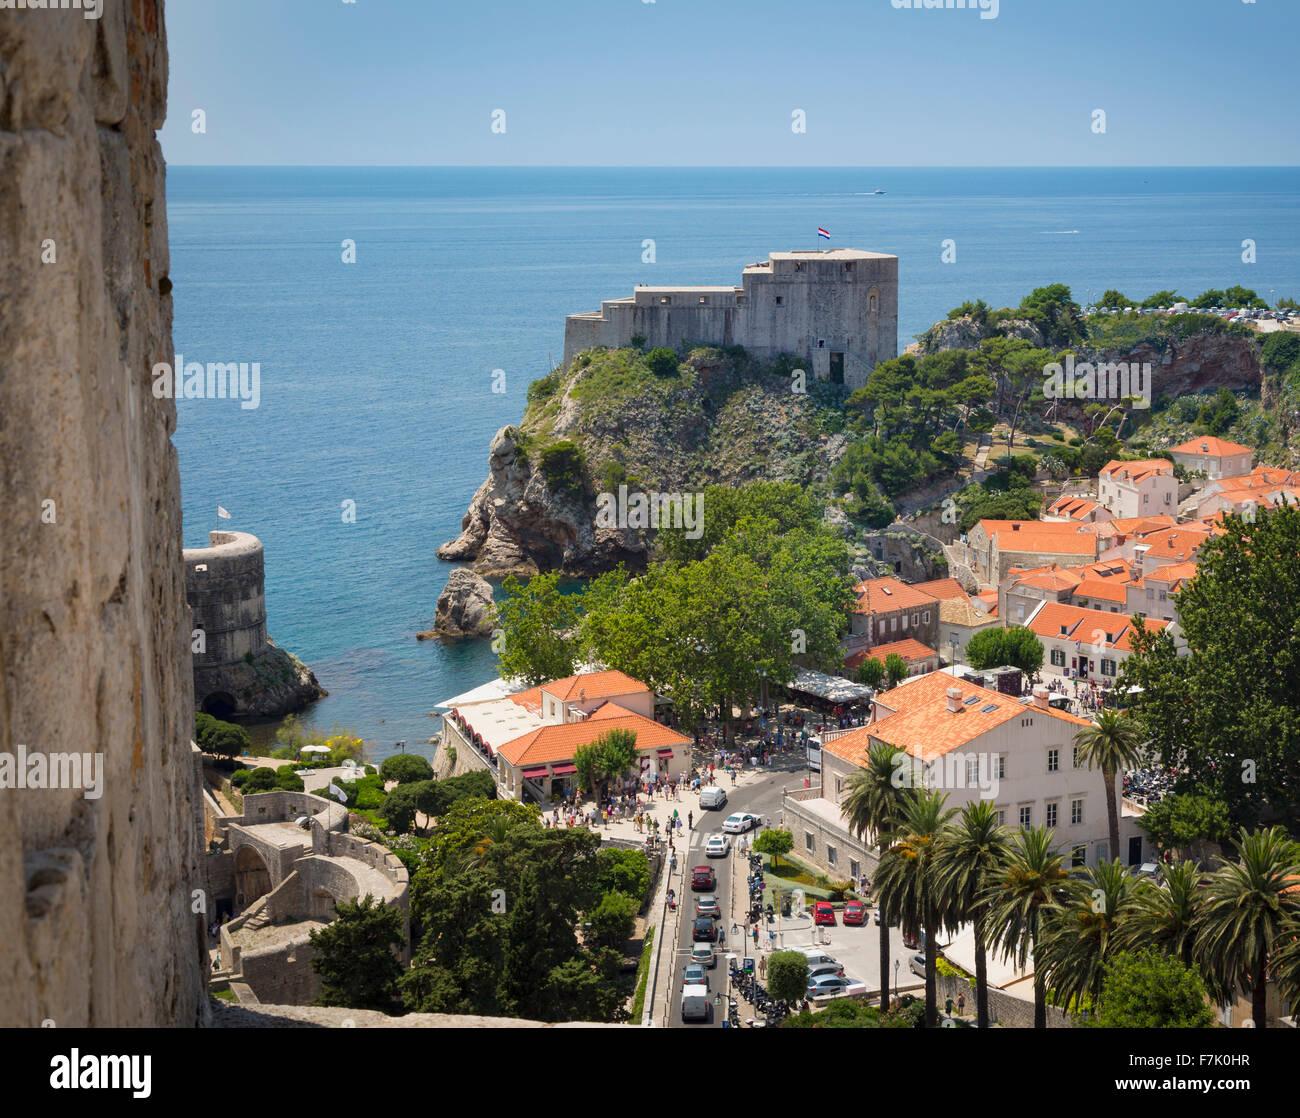 Dubrovnik, Dubrovnik-Neretva County, Croatia. Fort Lovrijenac or St. Lawrence Fortress. - Stock Image